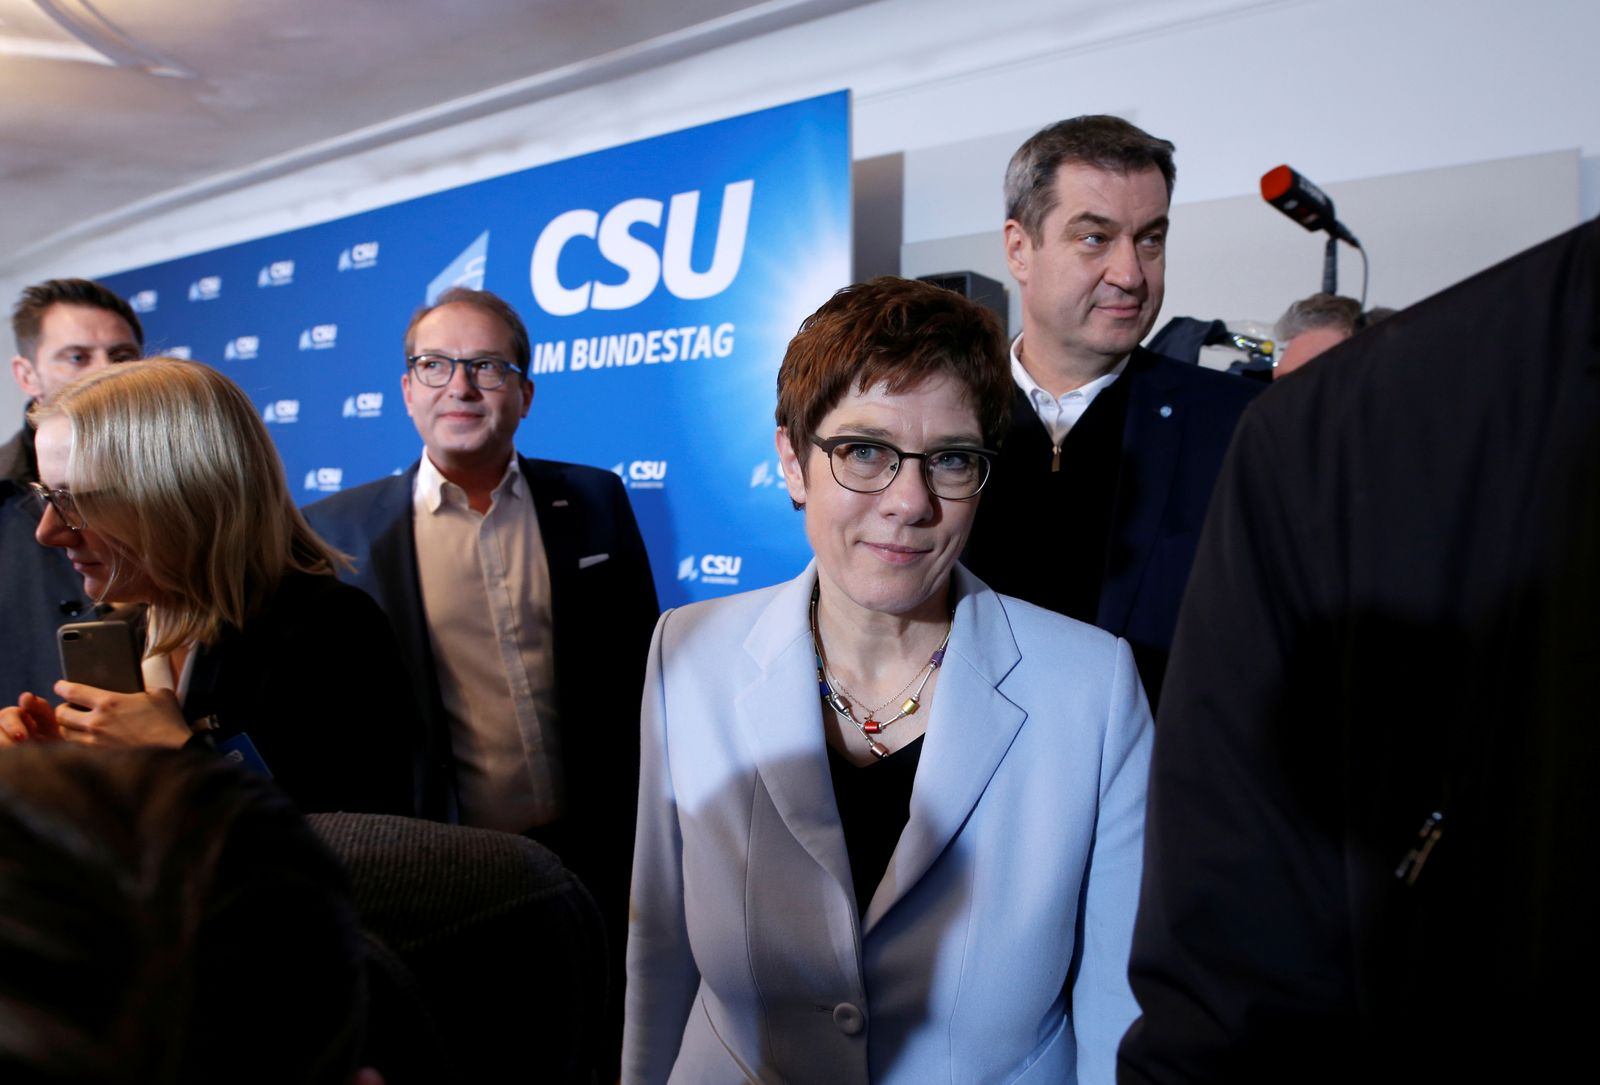 GERMANY-POLITICS/CSU